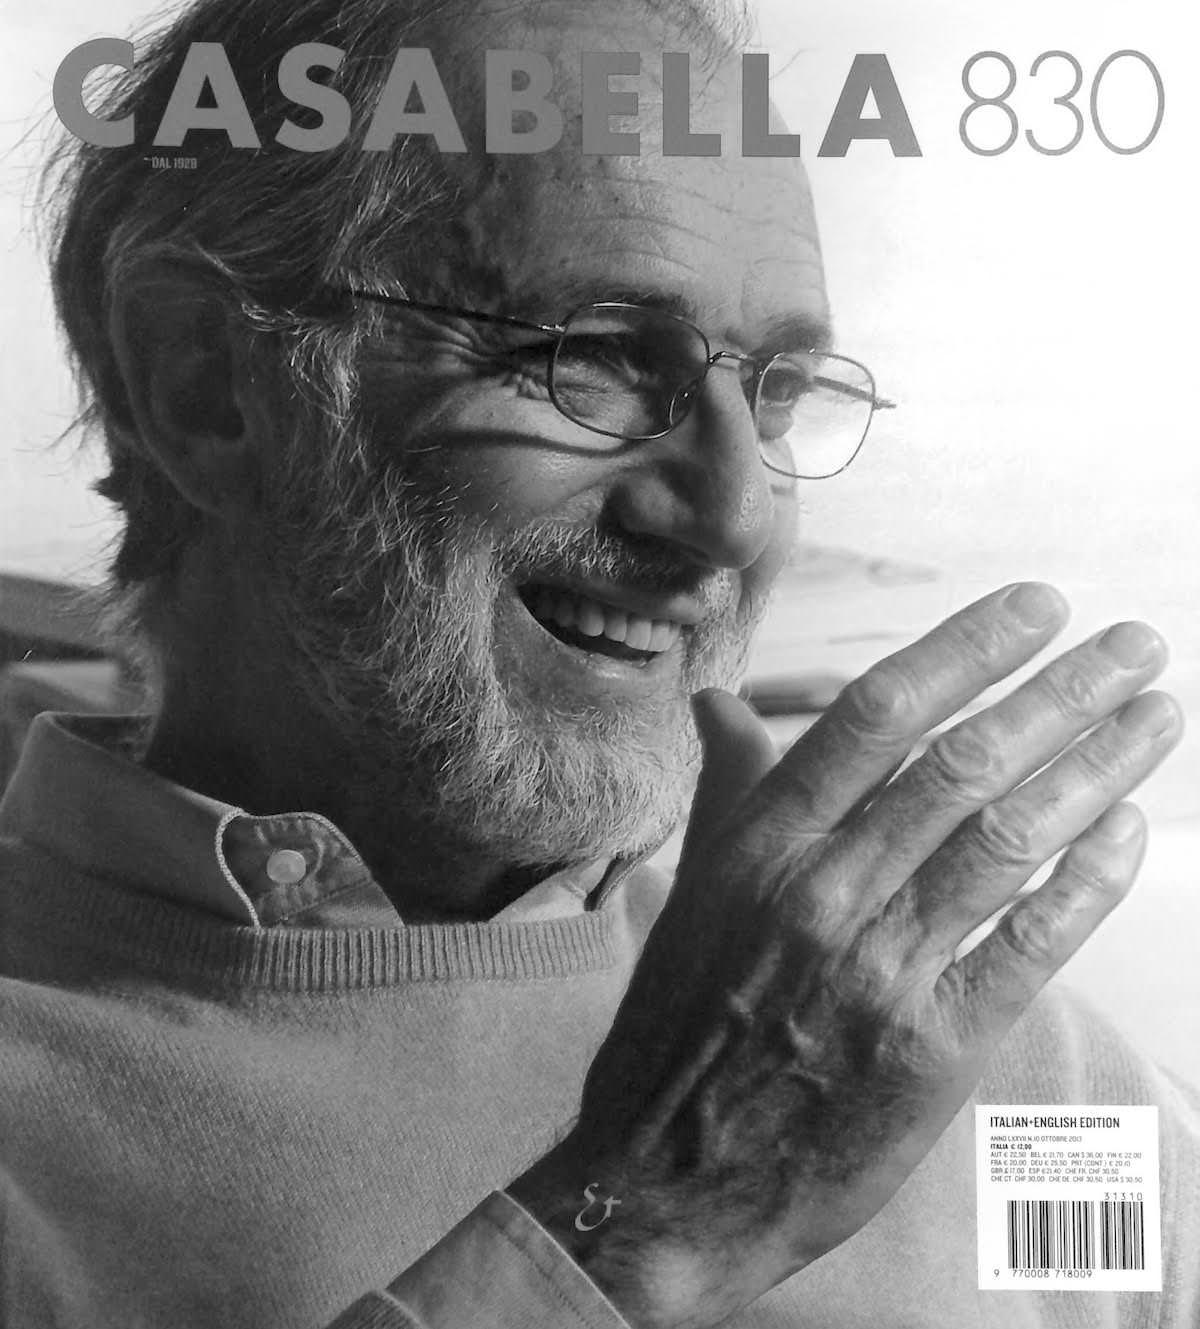 casabella-830-ottobre-2013